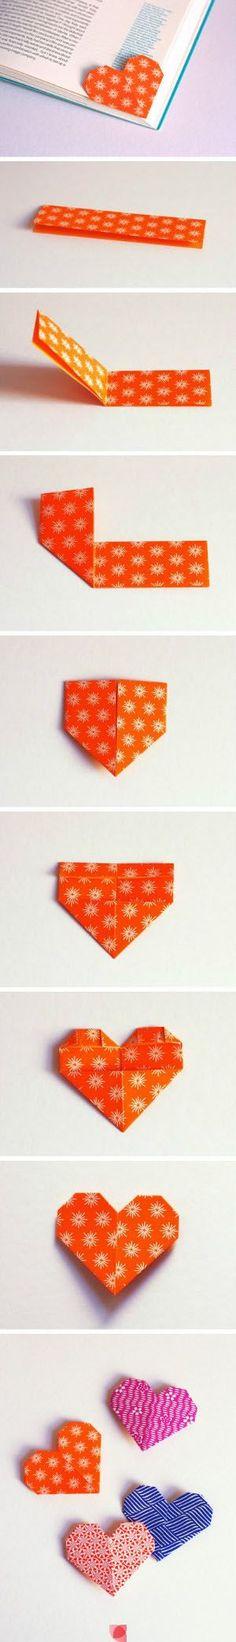 Origami- Origami sabine v.Appeldorn sabinevappeldor Kreatives Origami sabine v.Appeldorn Origami sabinevappeldor Origami Kreatives Origami sabine v. Origami Diy, Origami Paper, Diy Paper, Paper Crafting, Heart Origami, Origami Tutorial, Origami Ball, Origami Instructions, Origami Boxes